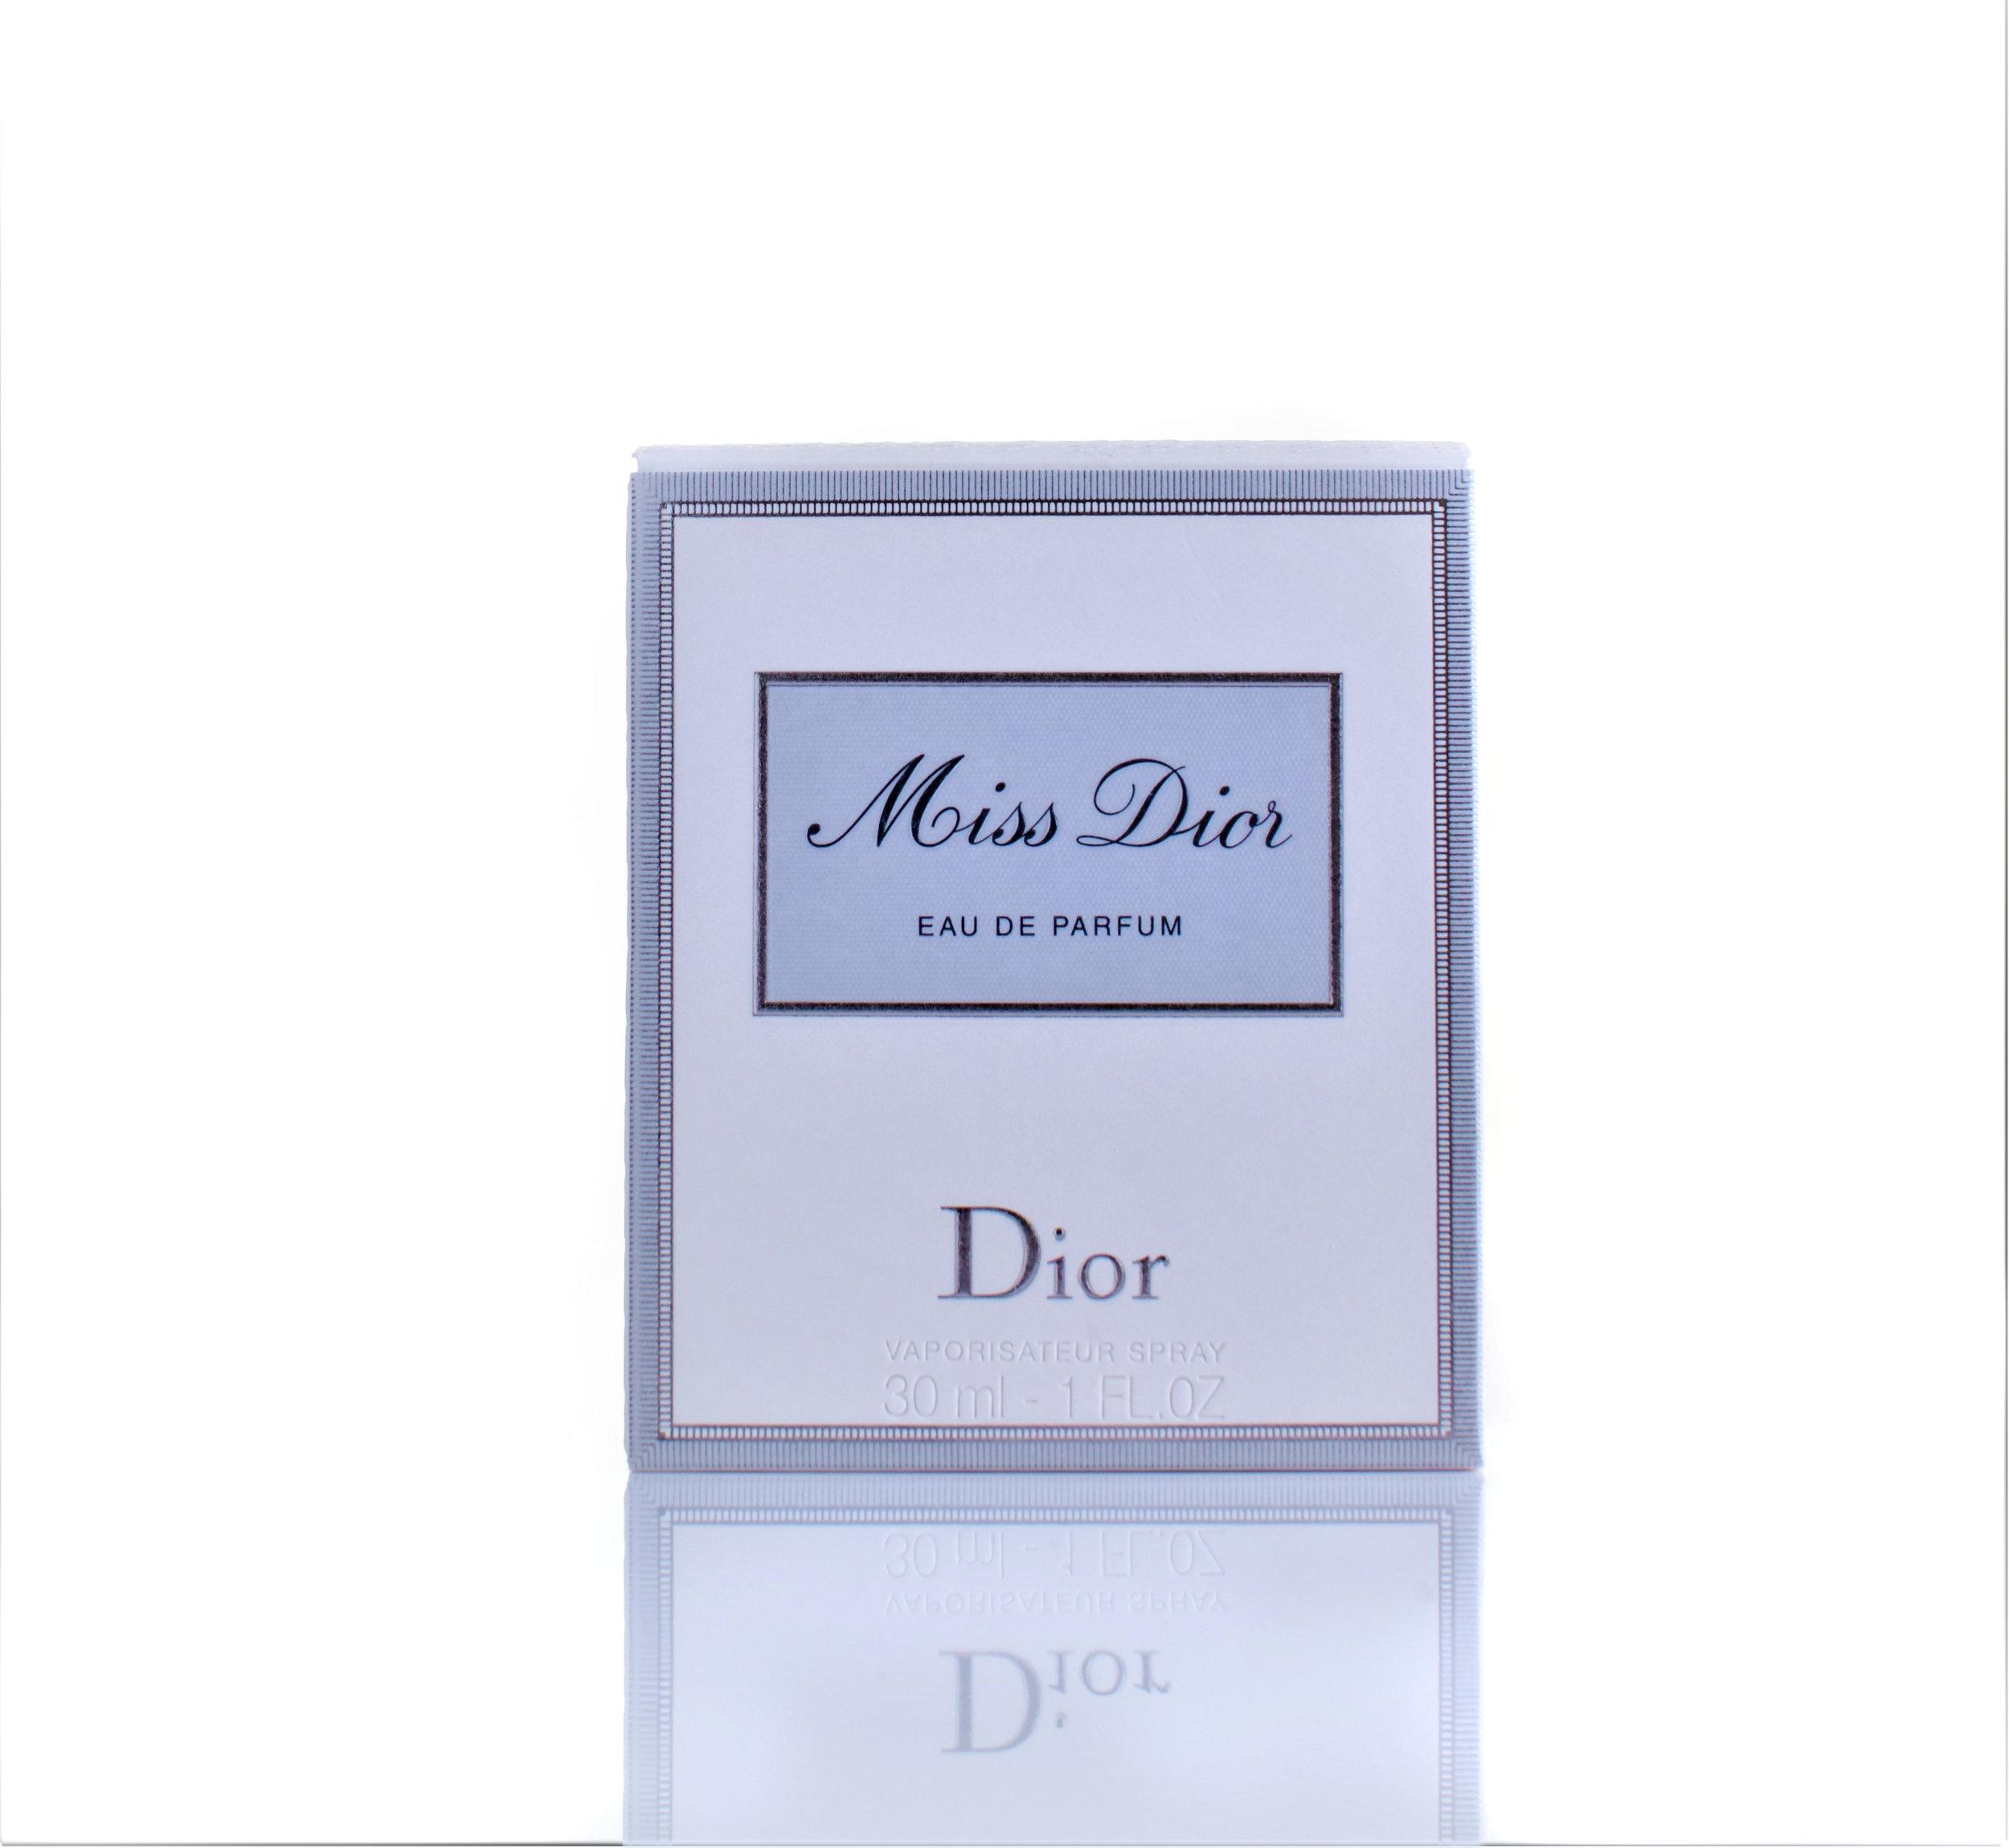 Dior Box White Background